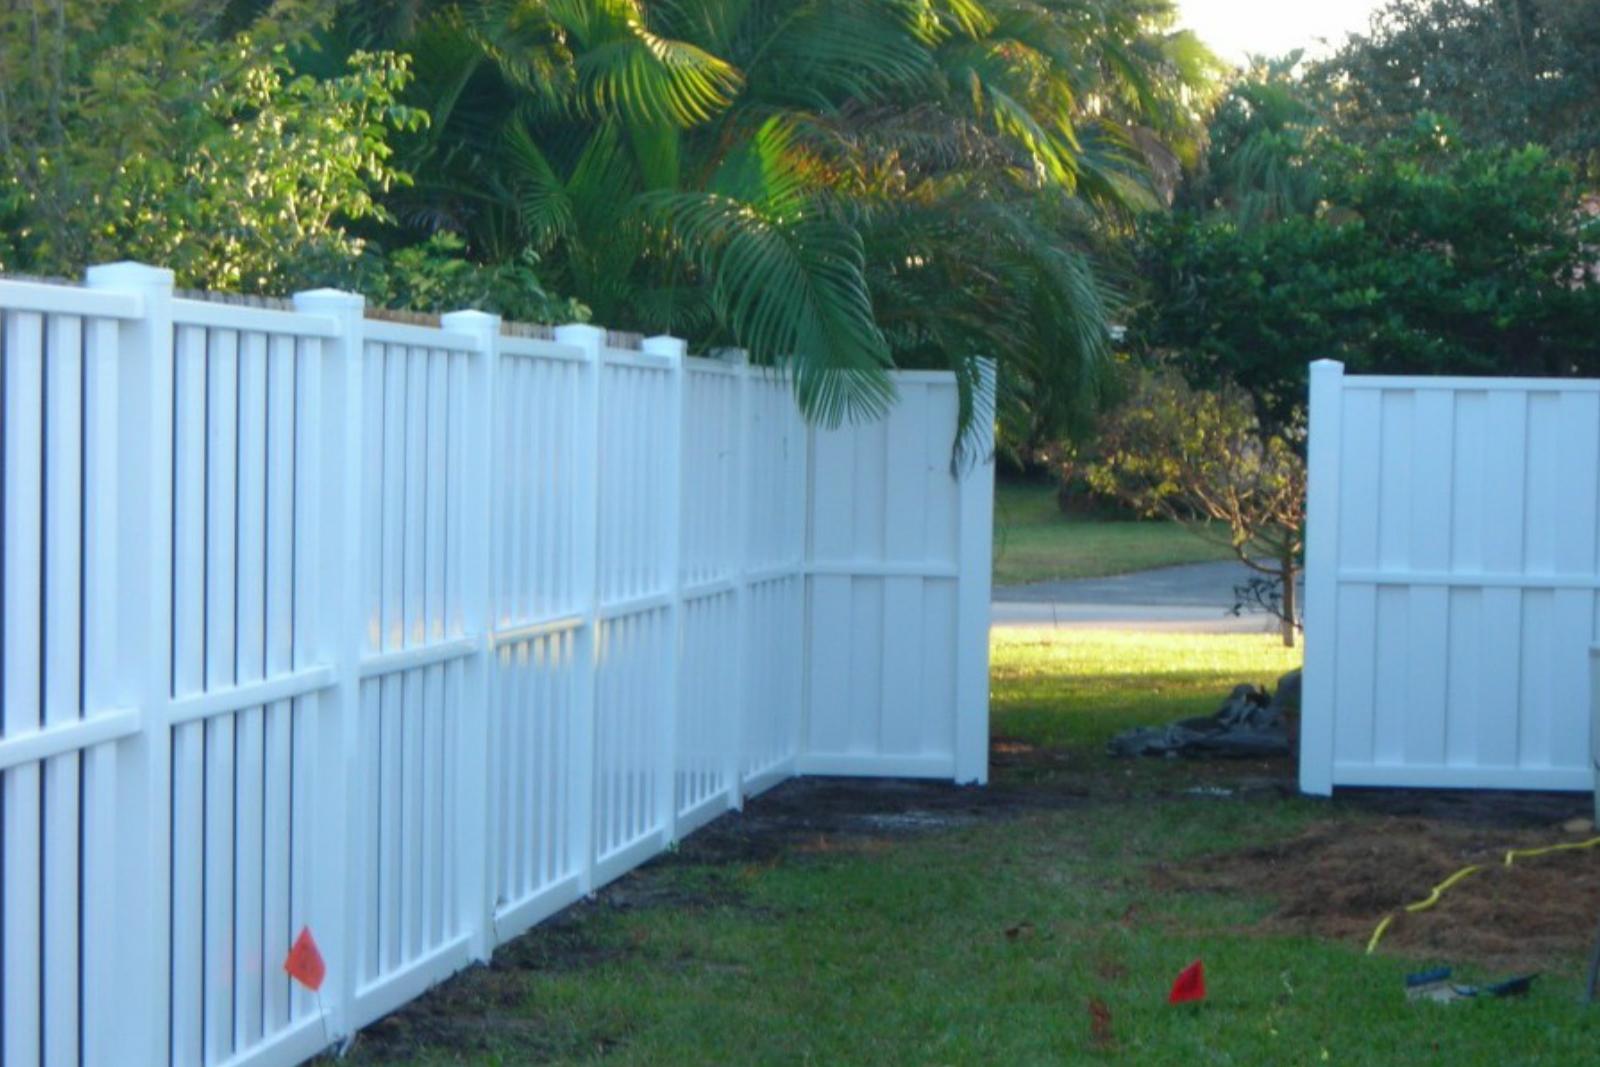 zepco fence company PVC fences